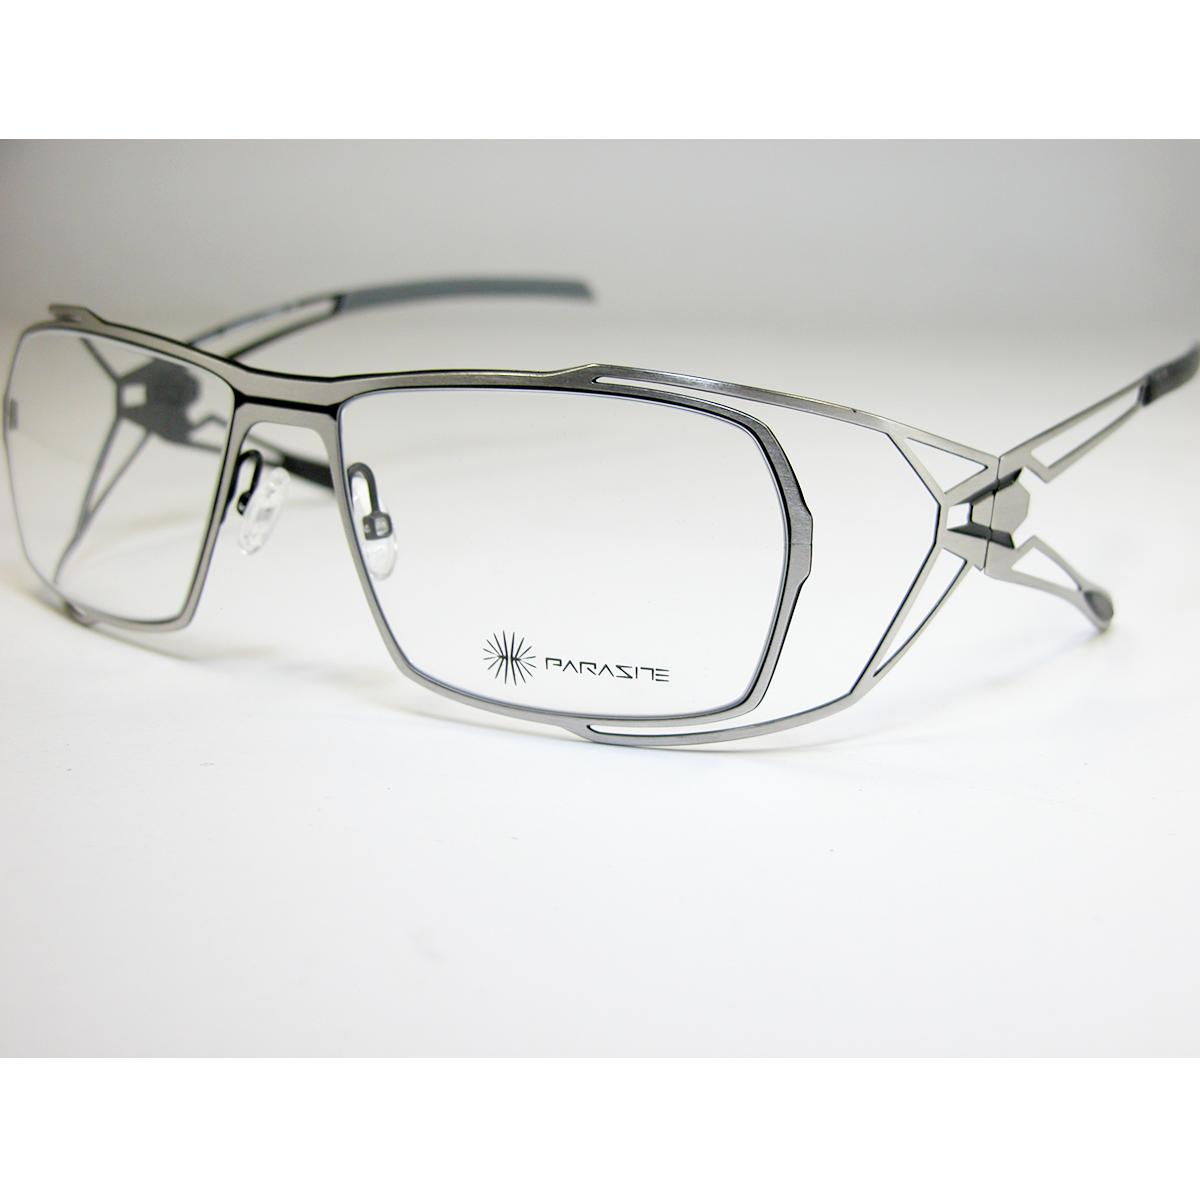 PARASITE (パラサイト)サングラス Element9 カラー58 メンズ メガネ サングラス【ありがとう】【店頭受取対応商品】